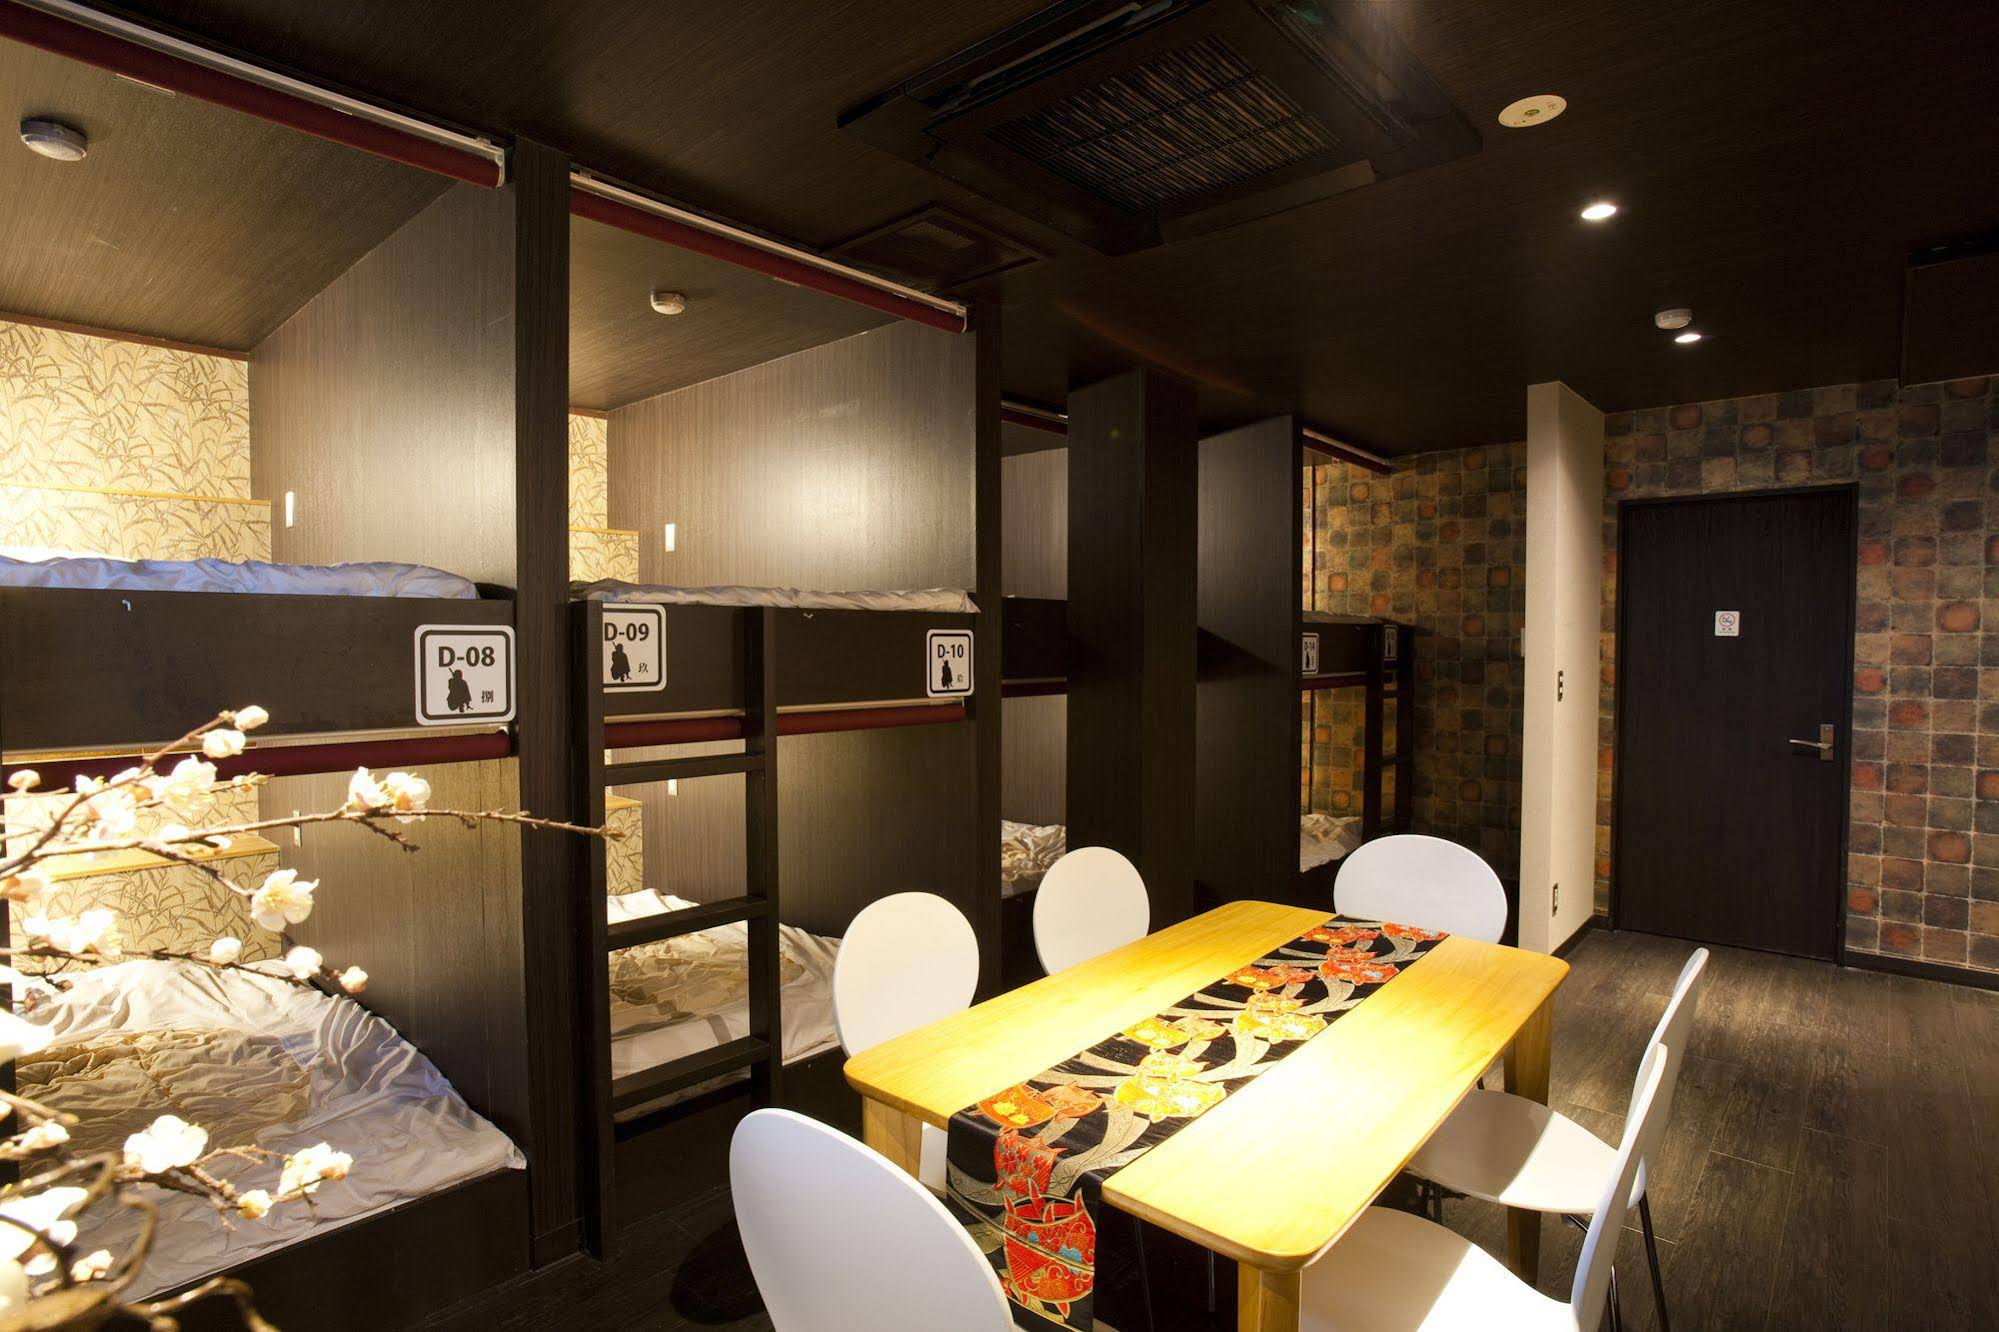 The Ryokan Tokyo YUGAWARA Hostel